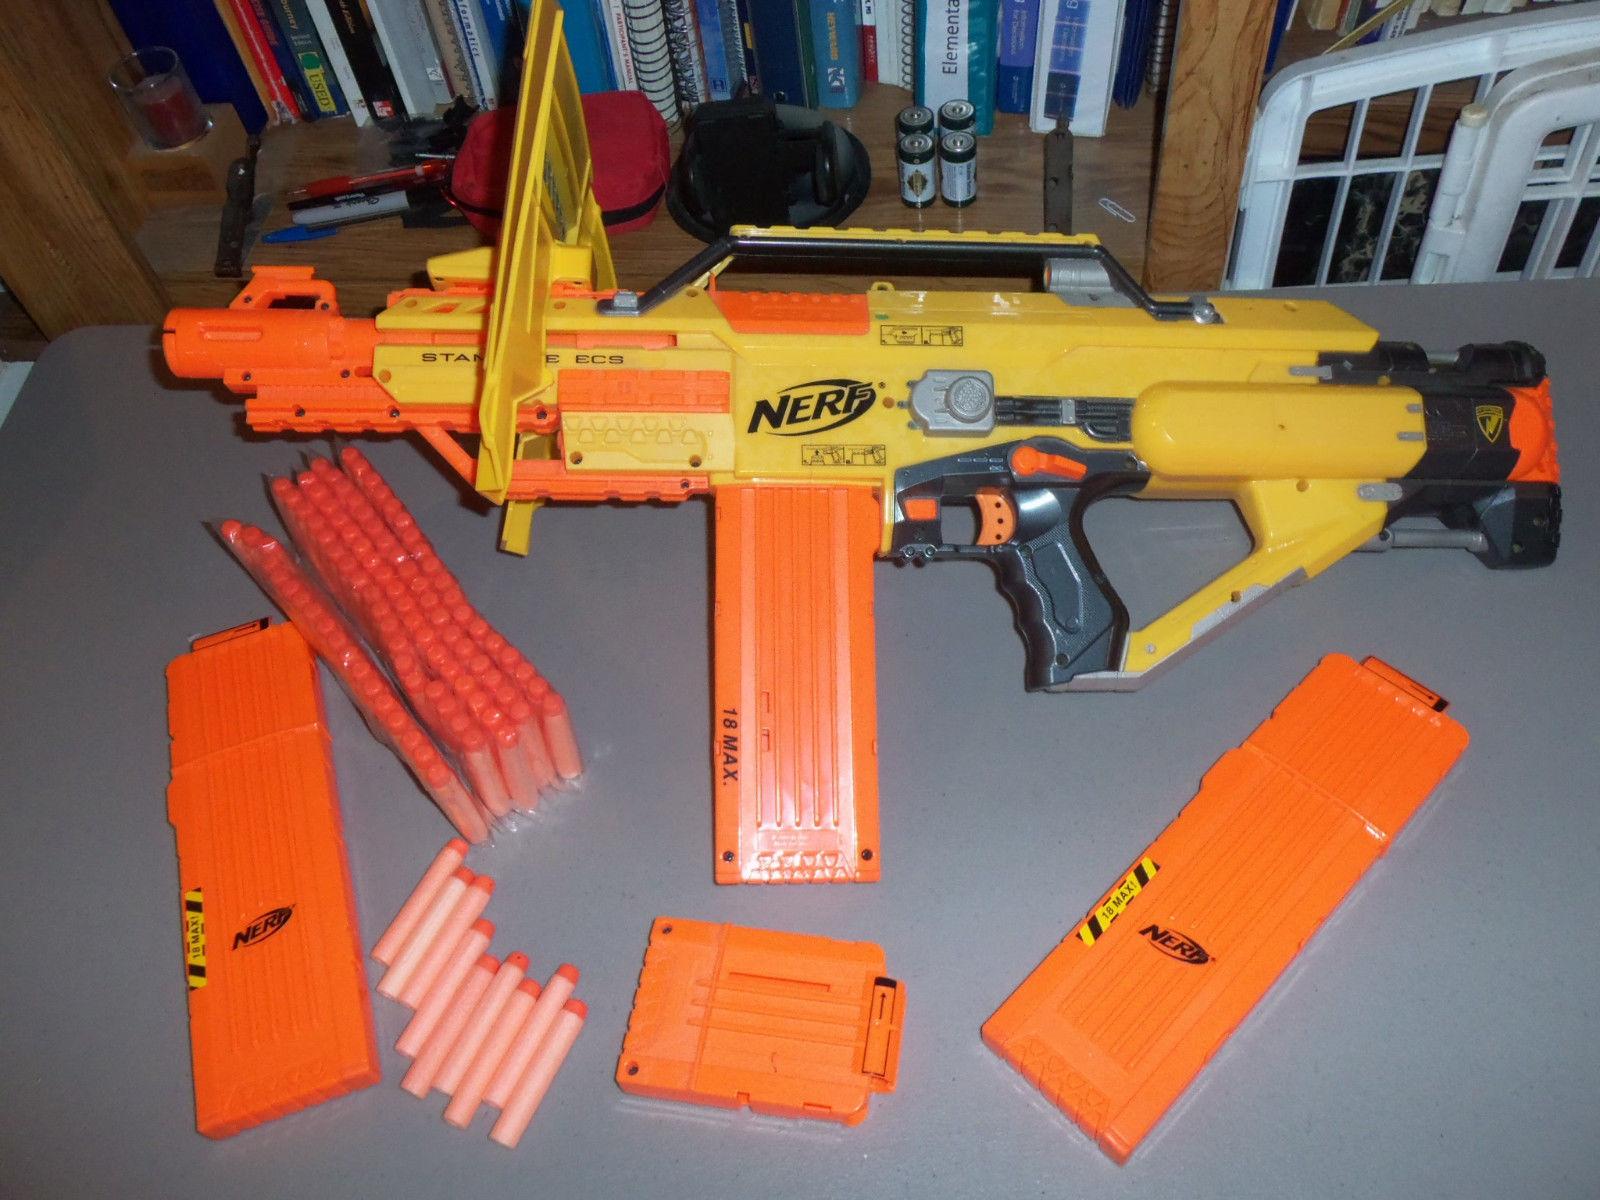 Nerf N Strike Stampede Ecs Outdoor Foam Dart Gun W Shield